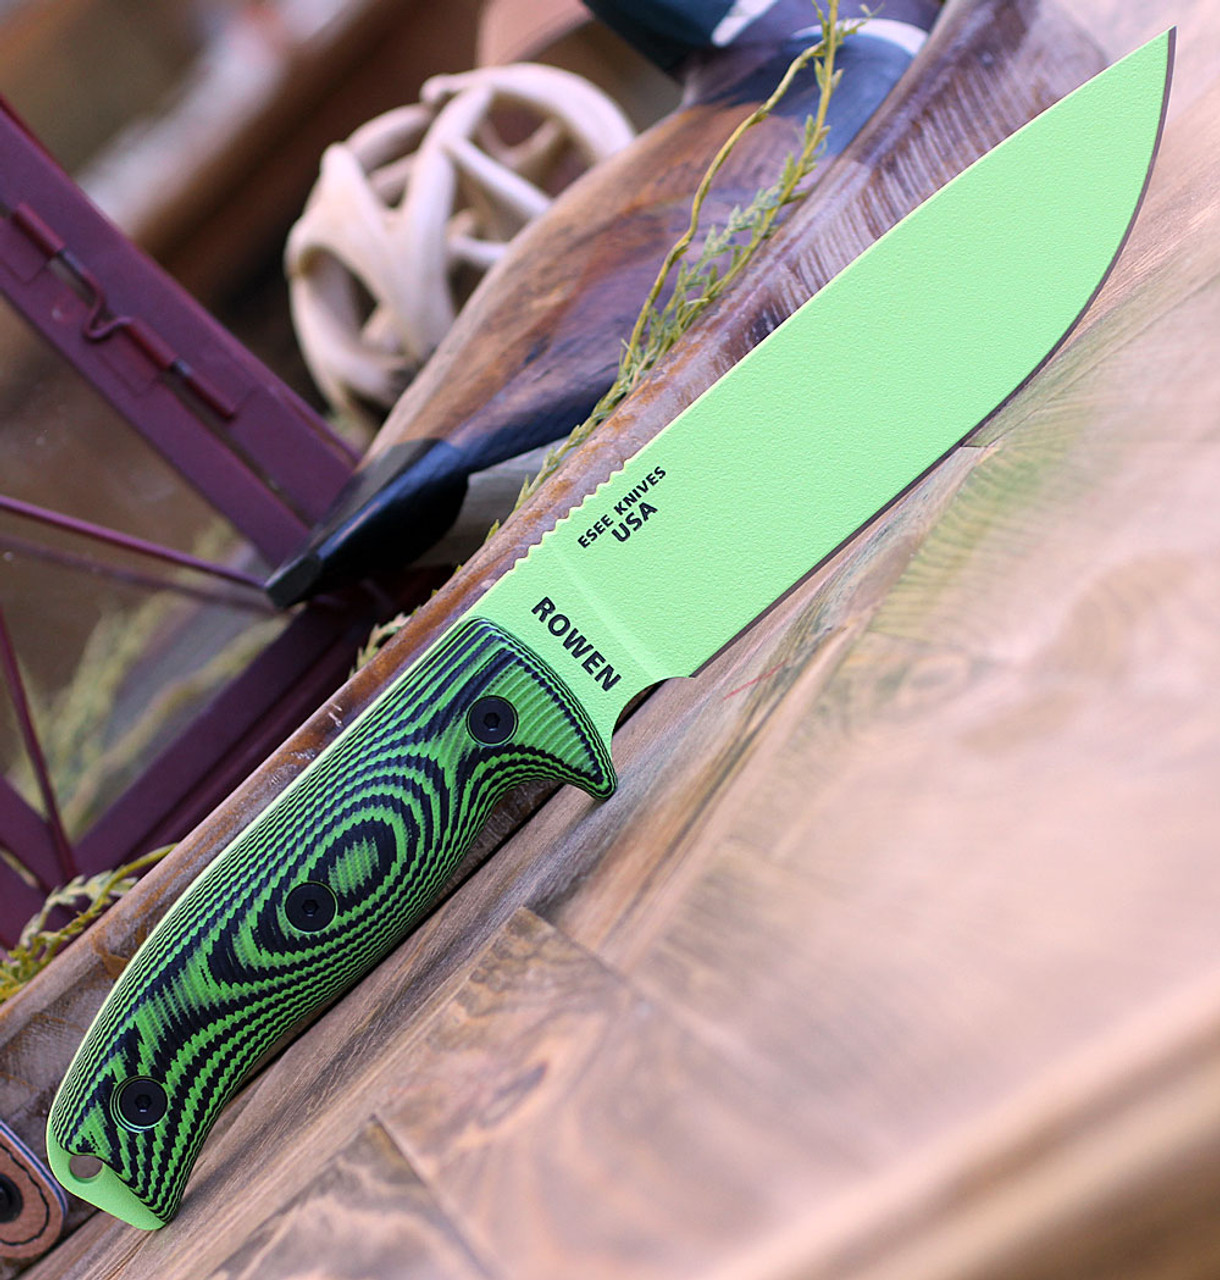 "ESEE-6 6PVG-007, 5.75"" 1095 Carbon Steel Venom Green Plain Blade, Neon Green/Black G10 3D Handle, Black Molded Sheath"